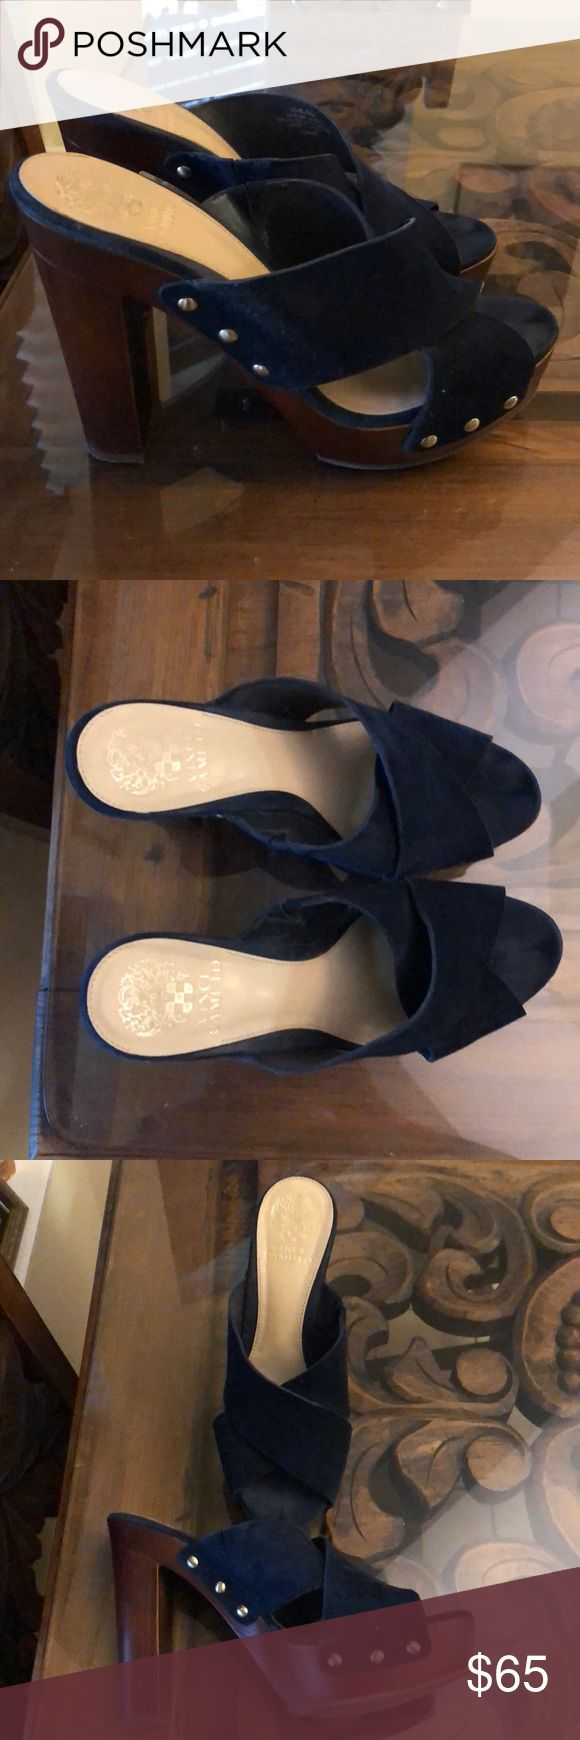 Vince-Camuto blue-suede platform shoes | My Posh Picks ...